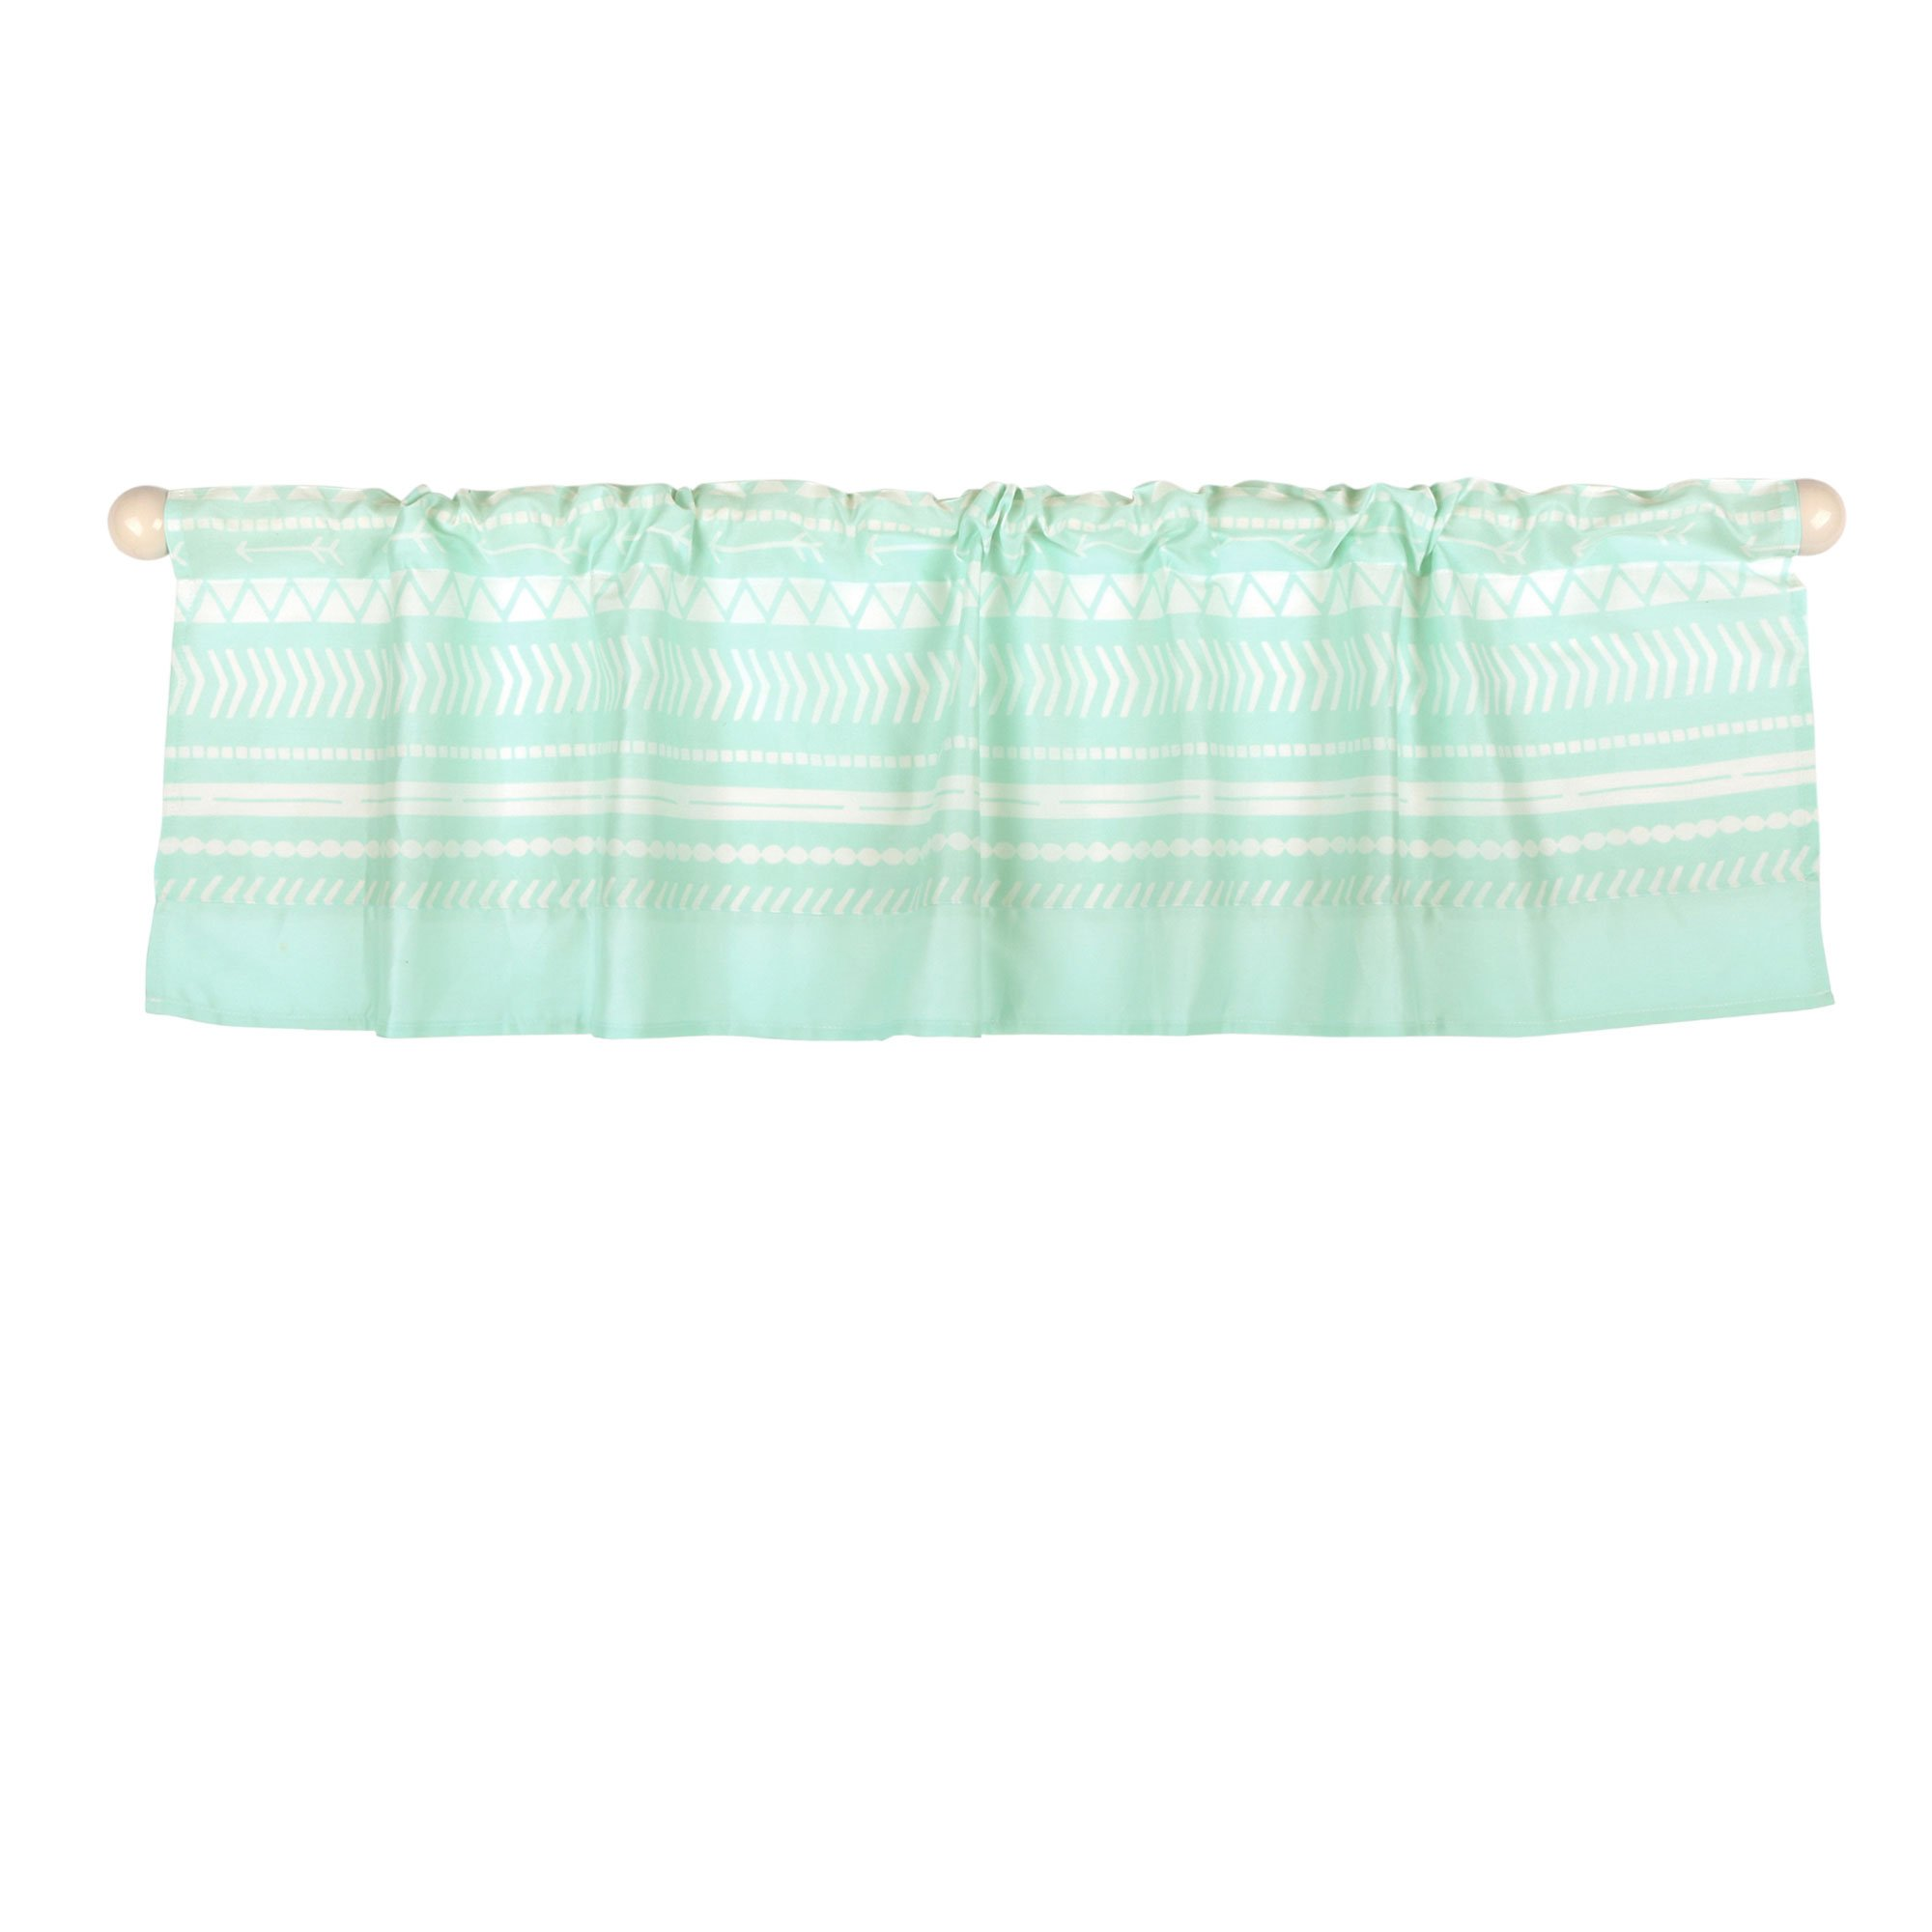 Mint Green Tribal Print Window Valance by The Peanut Shell - 100% Cotton Sateen